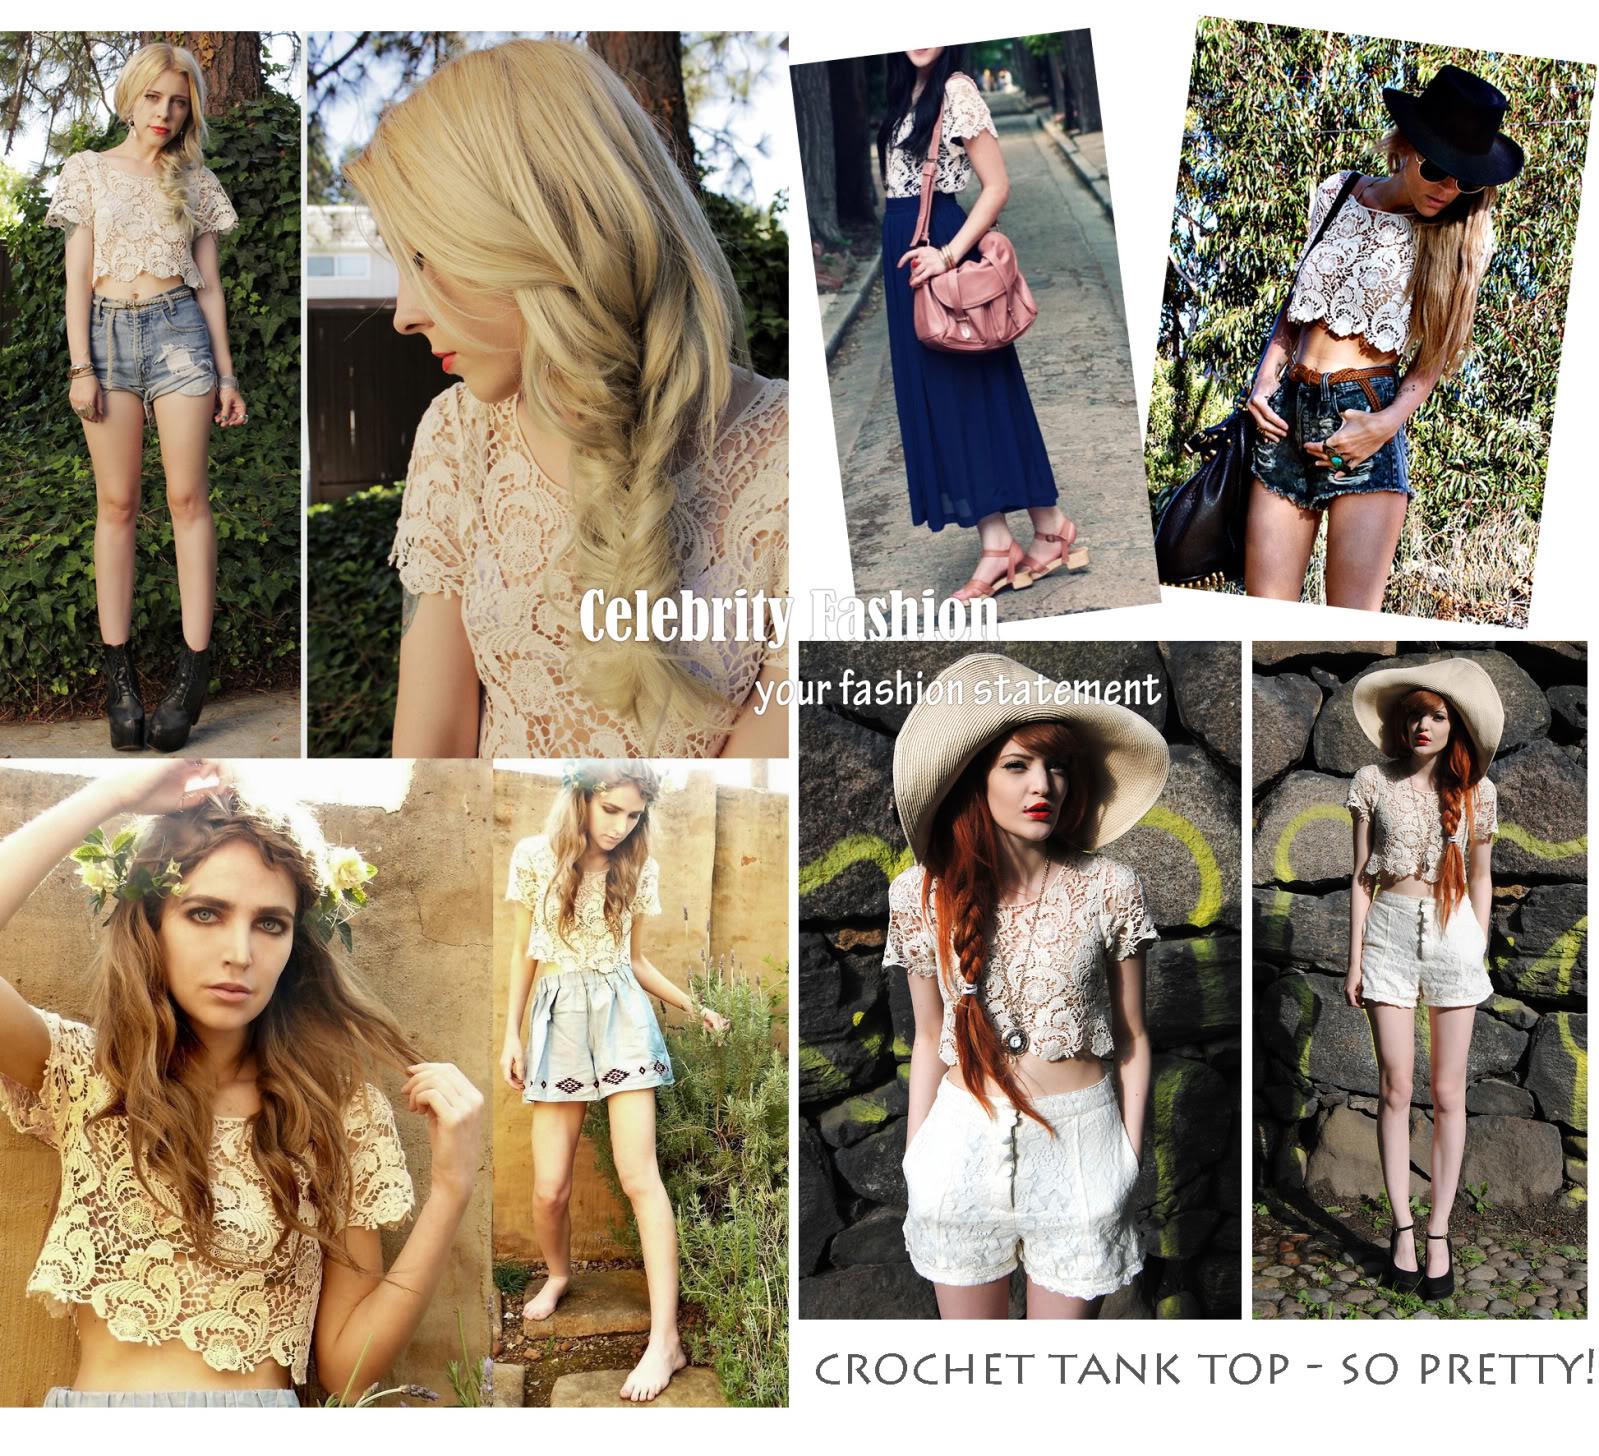 tp50 Celebrity Style Bohemian Vintage Crochet Lace Paisley Floral Crop Tank Top | eBay